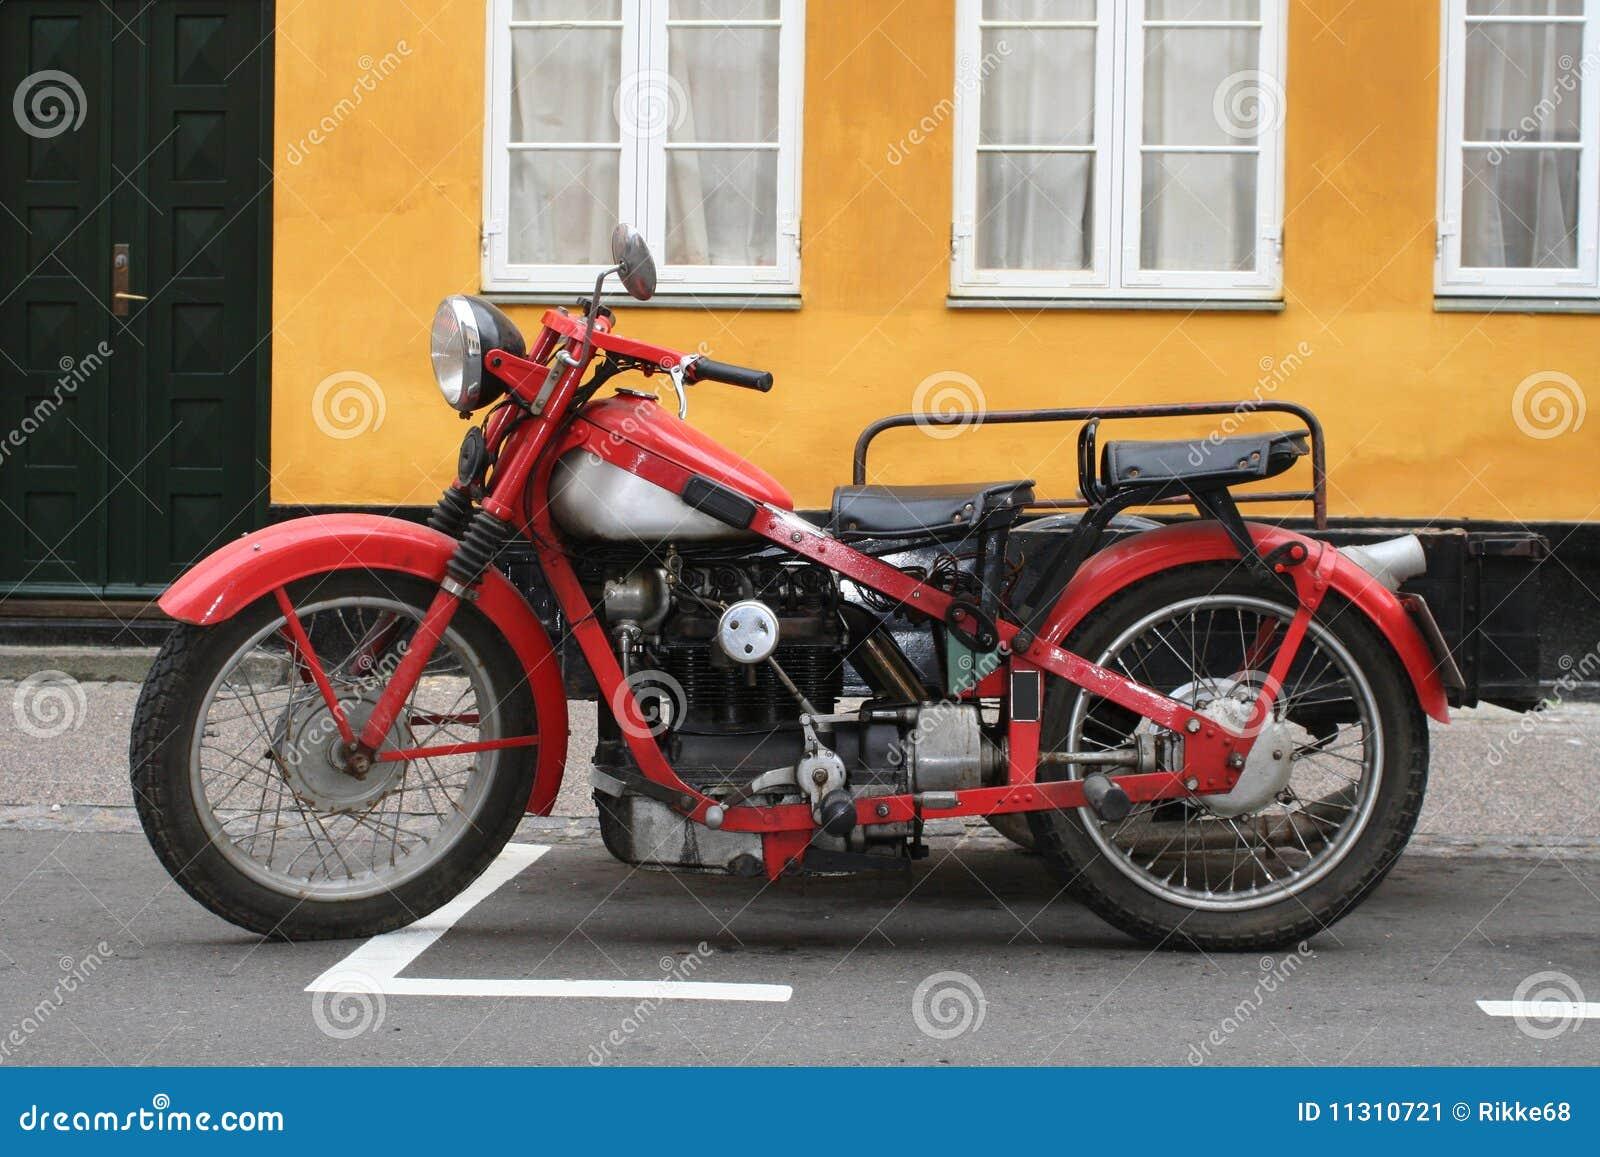 Vieux motoecycle